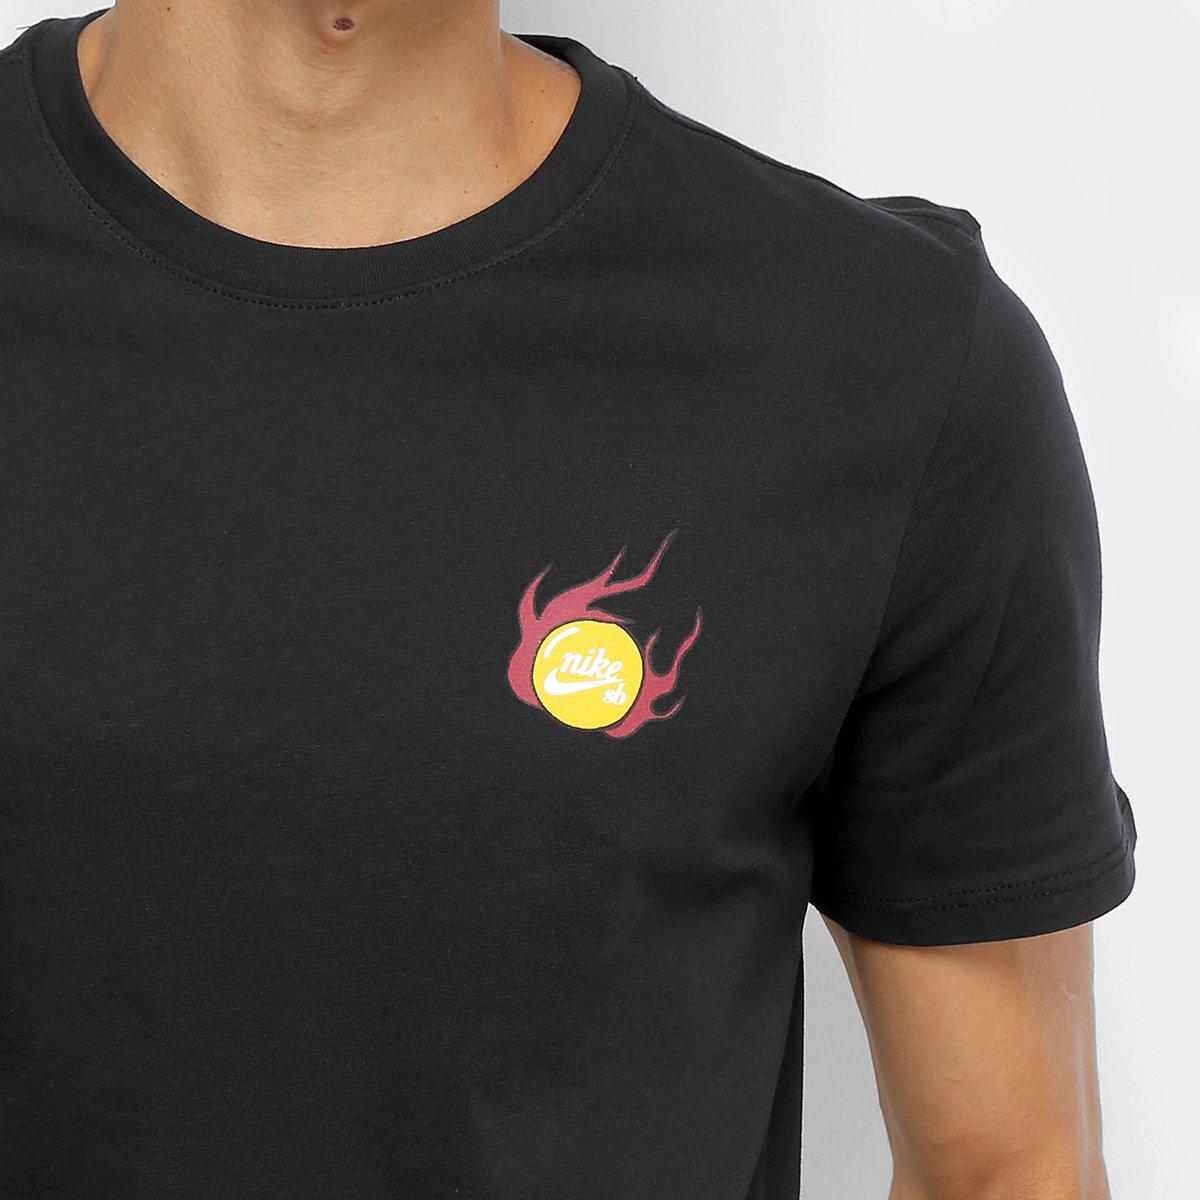 52a9892daf Camiseta Nike M Sb Dragon Masculina - Compre Agora